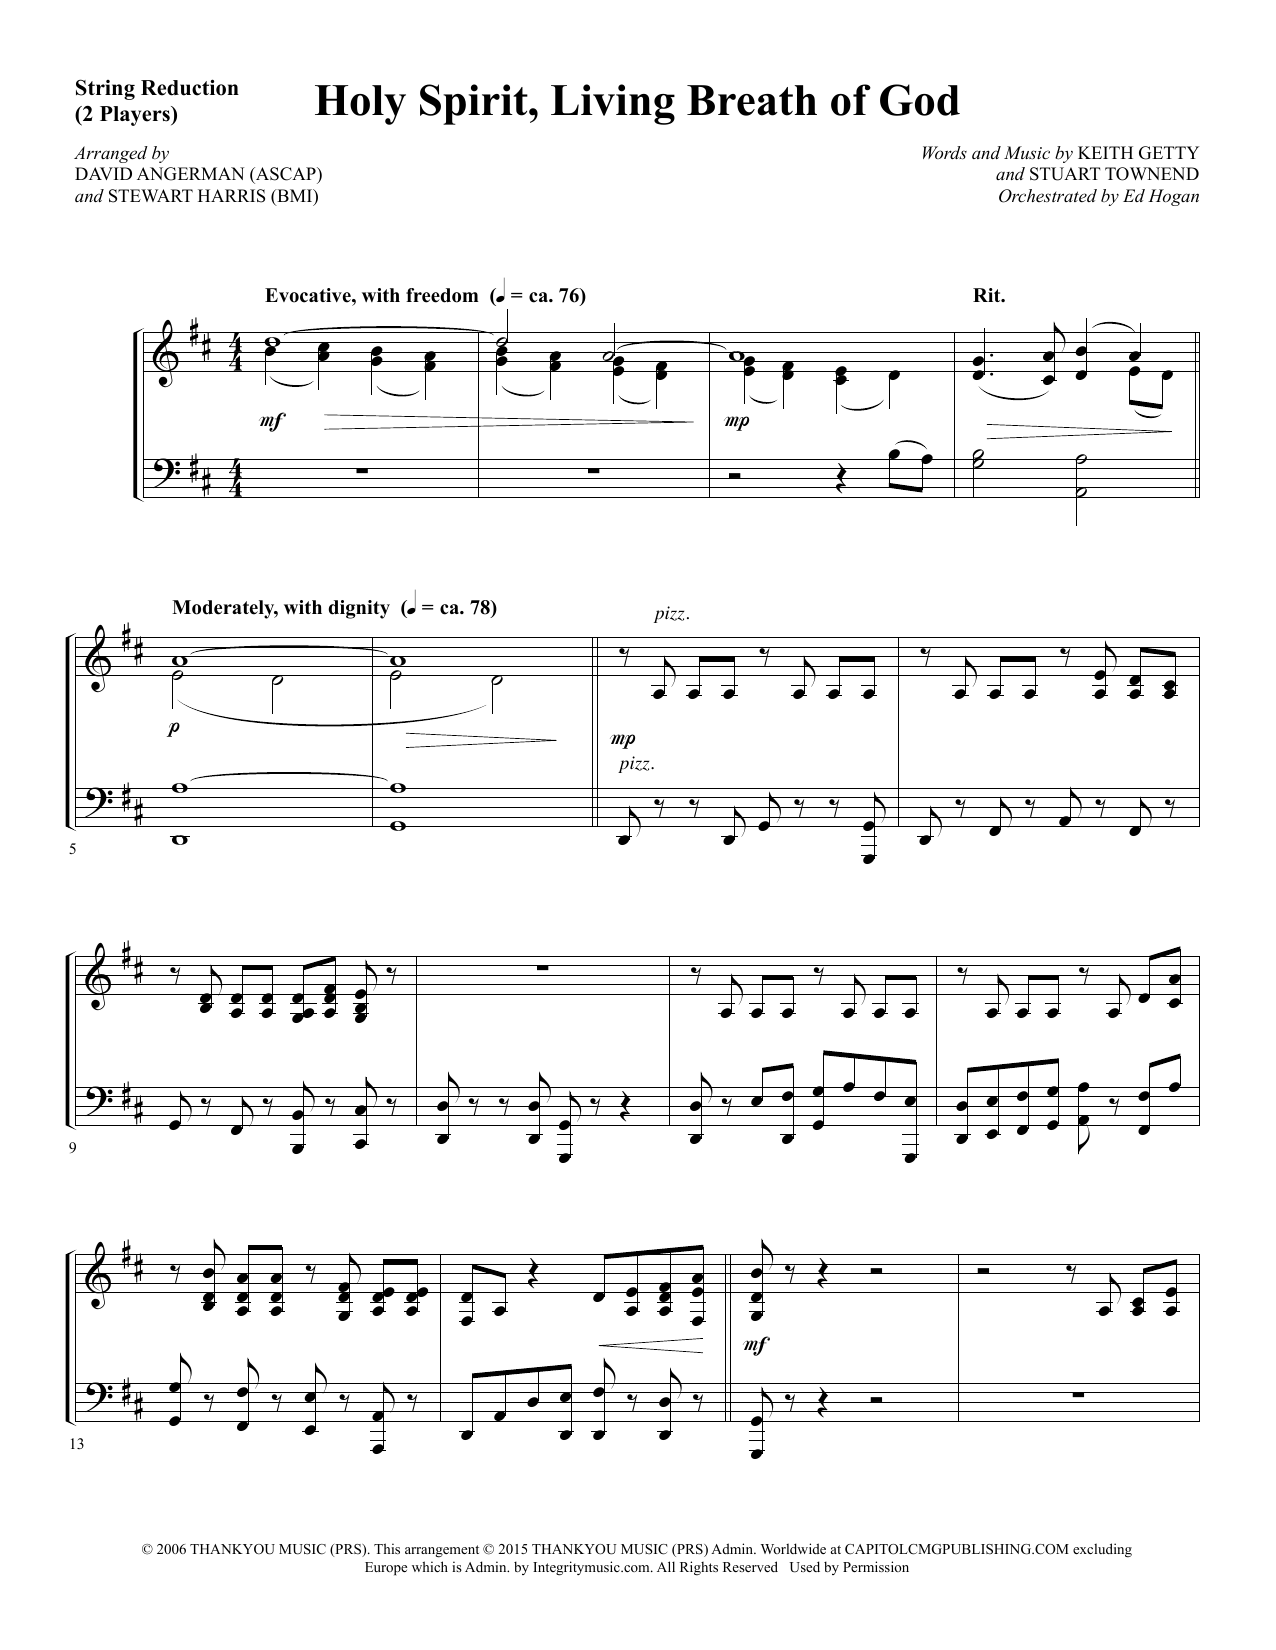 Holy Spirit, Living Breath of God - Keyboard String Reduction sheet music